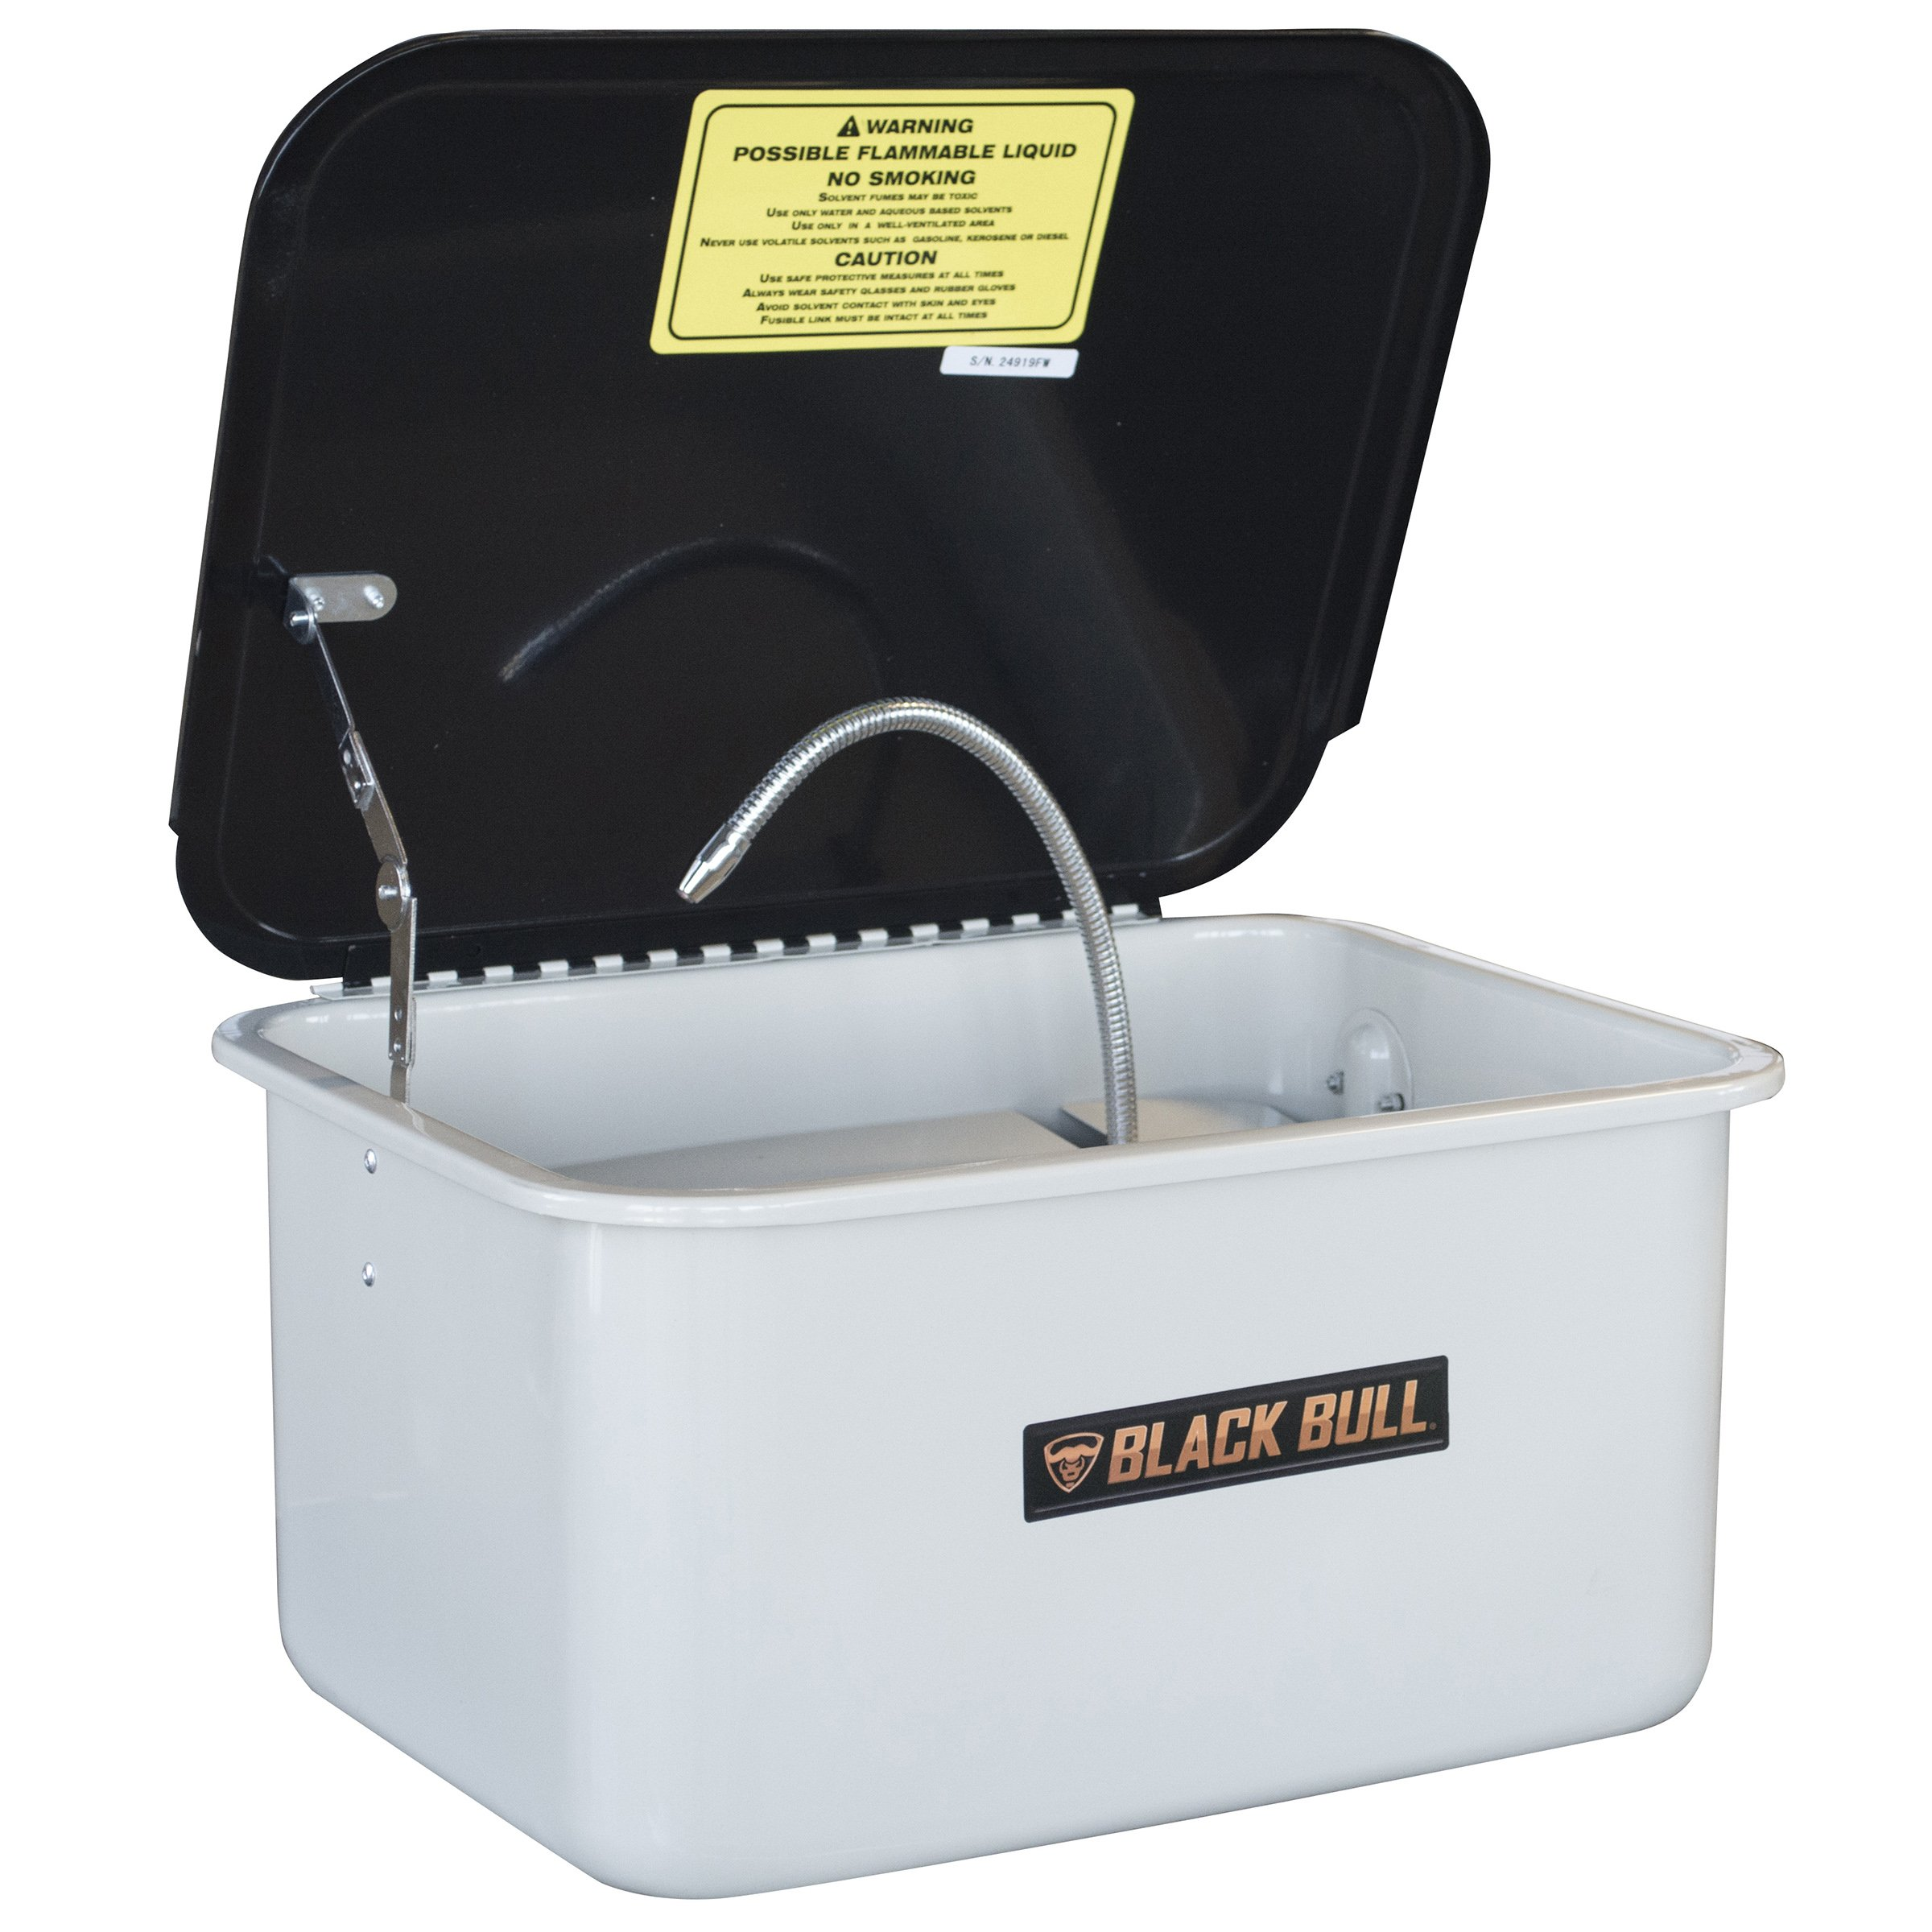 Black Bull PWASH35 Parts Washer with 3.5 Gallon Capacity